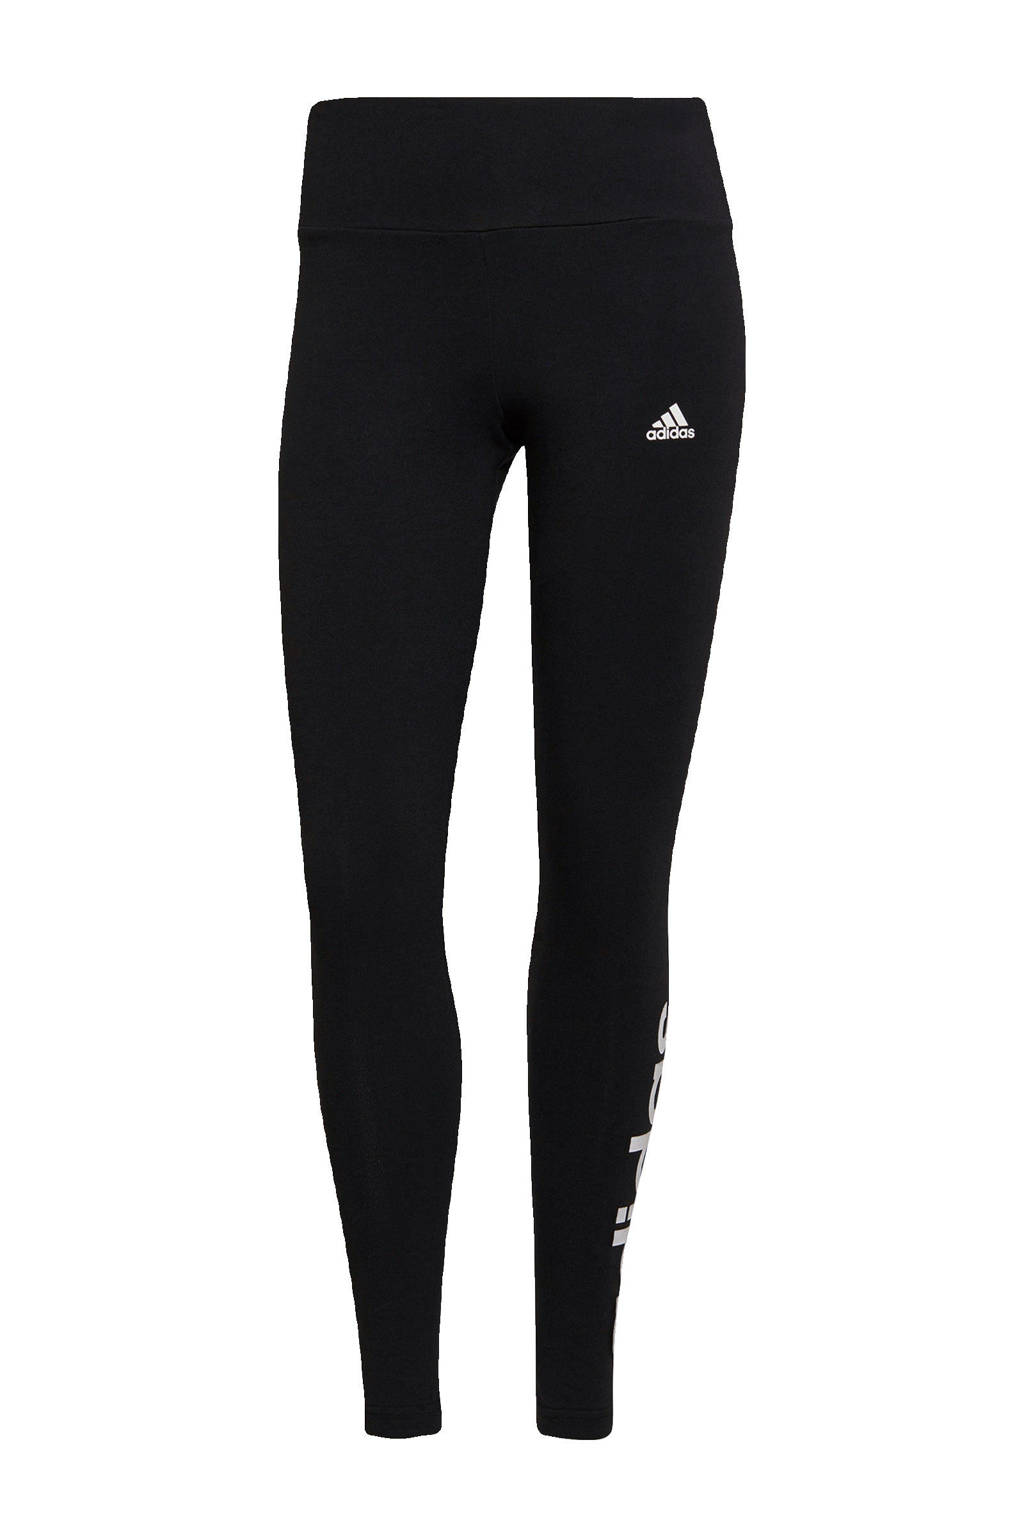 adidas Performance sportlegging zwart, Zwart